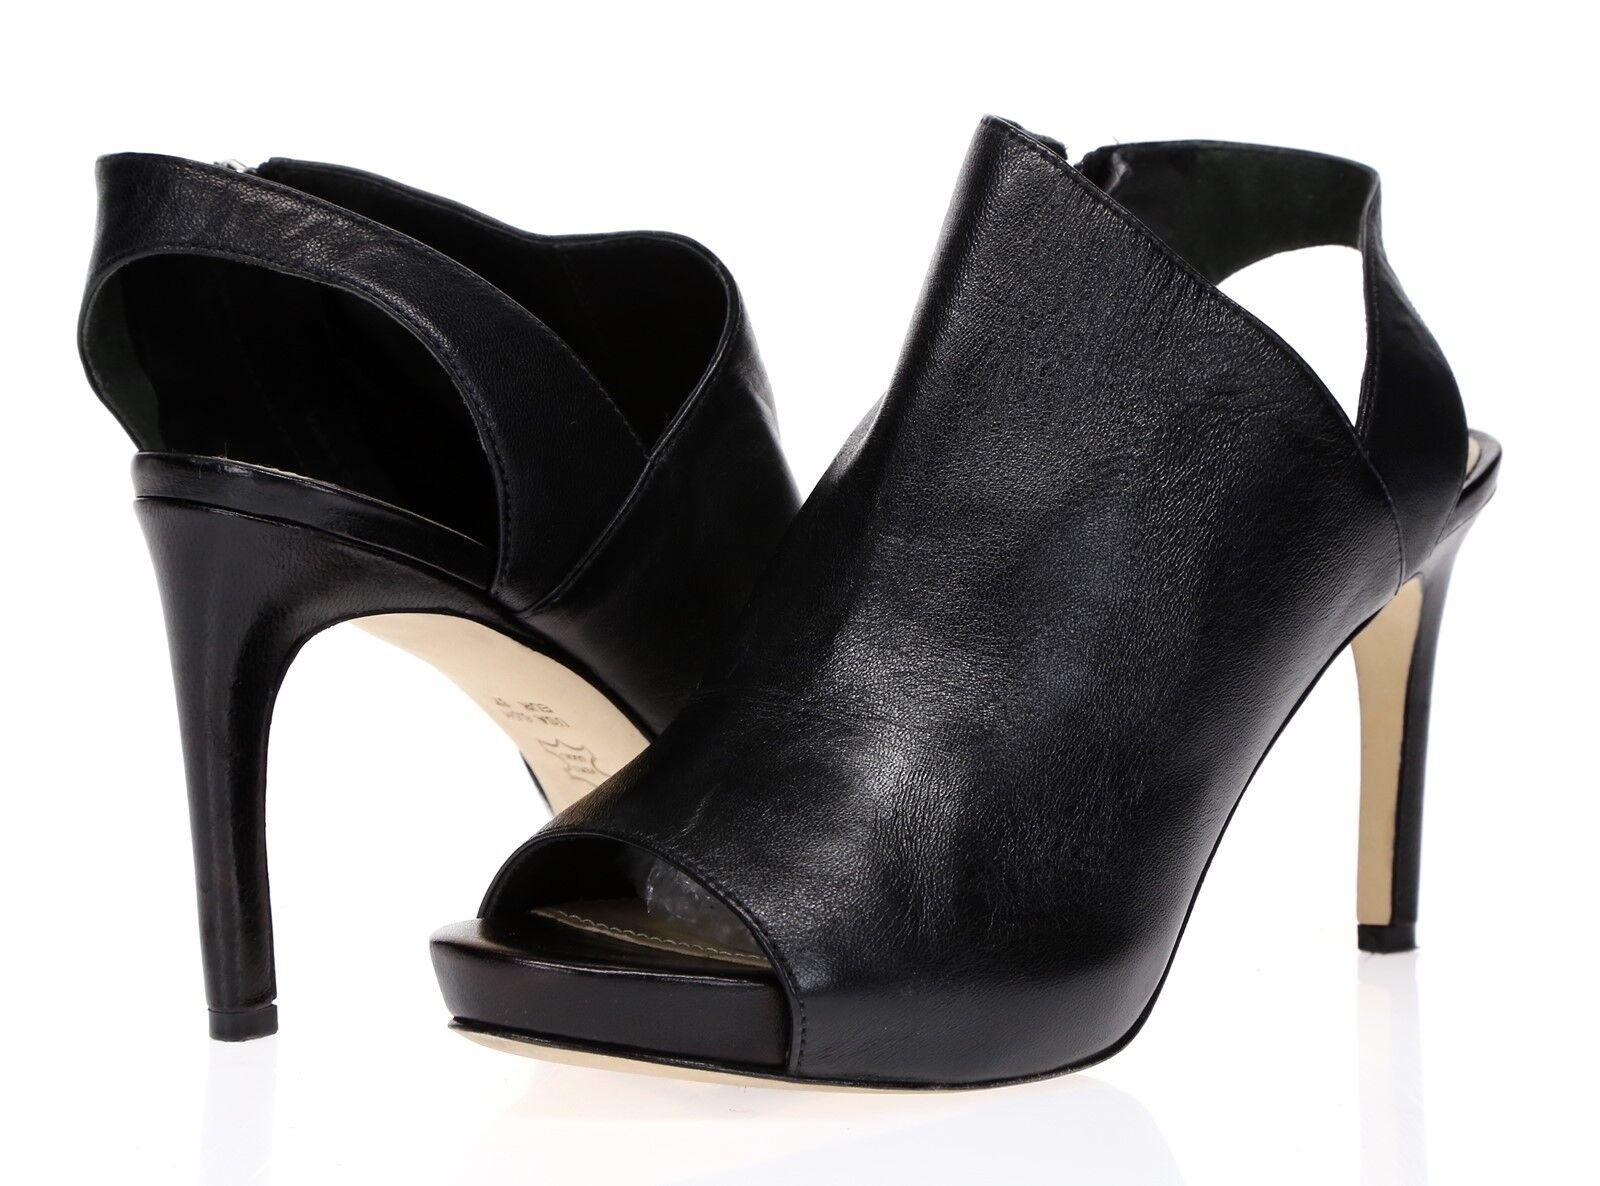 VIA SPIGA Womens Black Leather Slingback Heels Sandals Sz 6.5